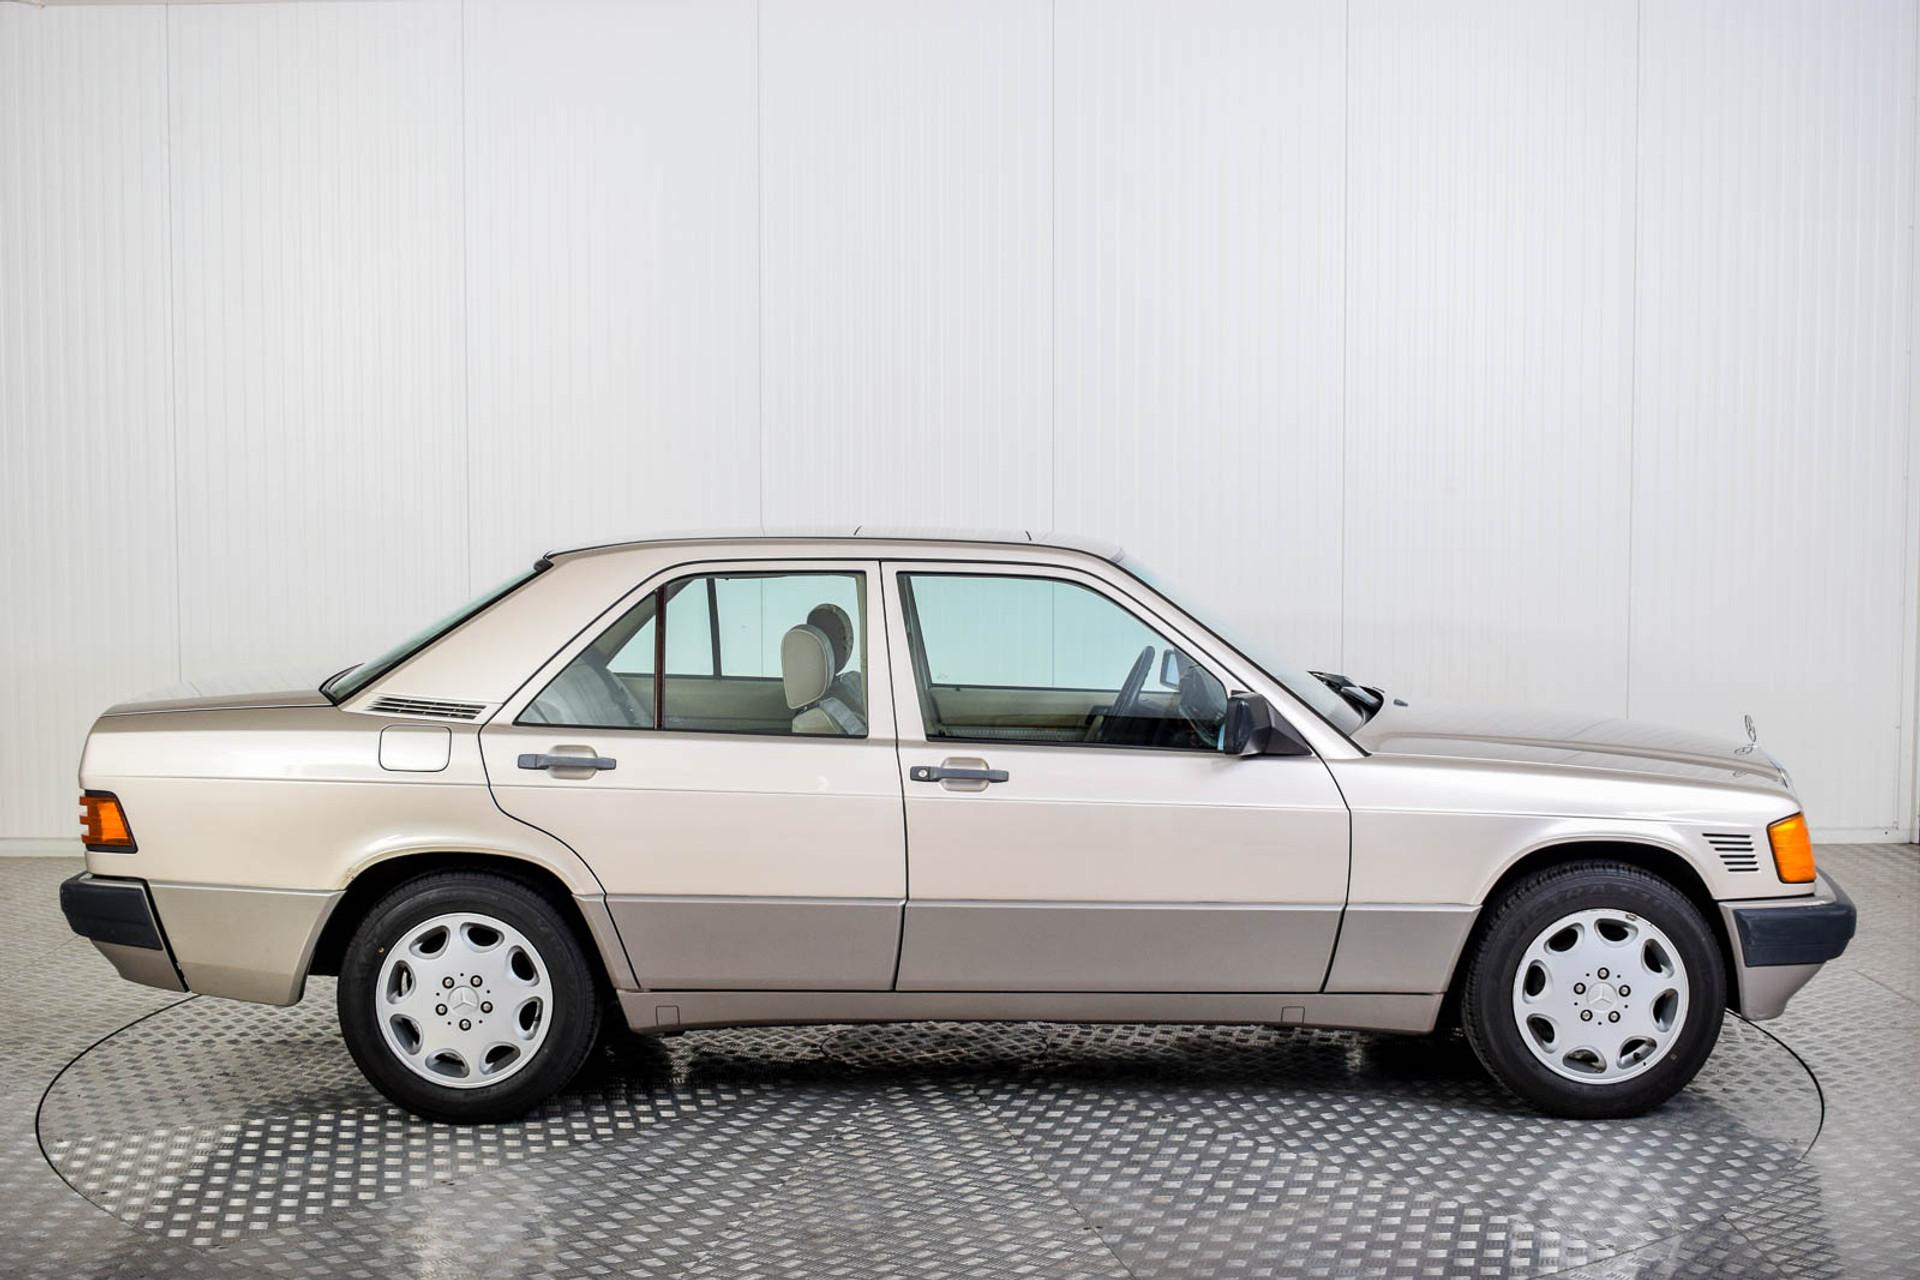 Mercedes-Benz 190 2.5 D Turbo Diesel Foto 34